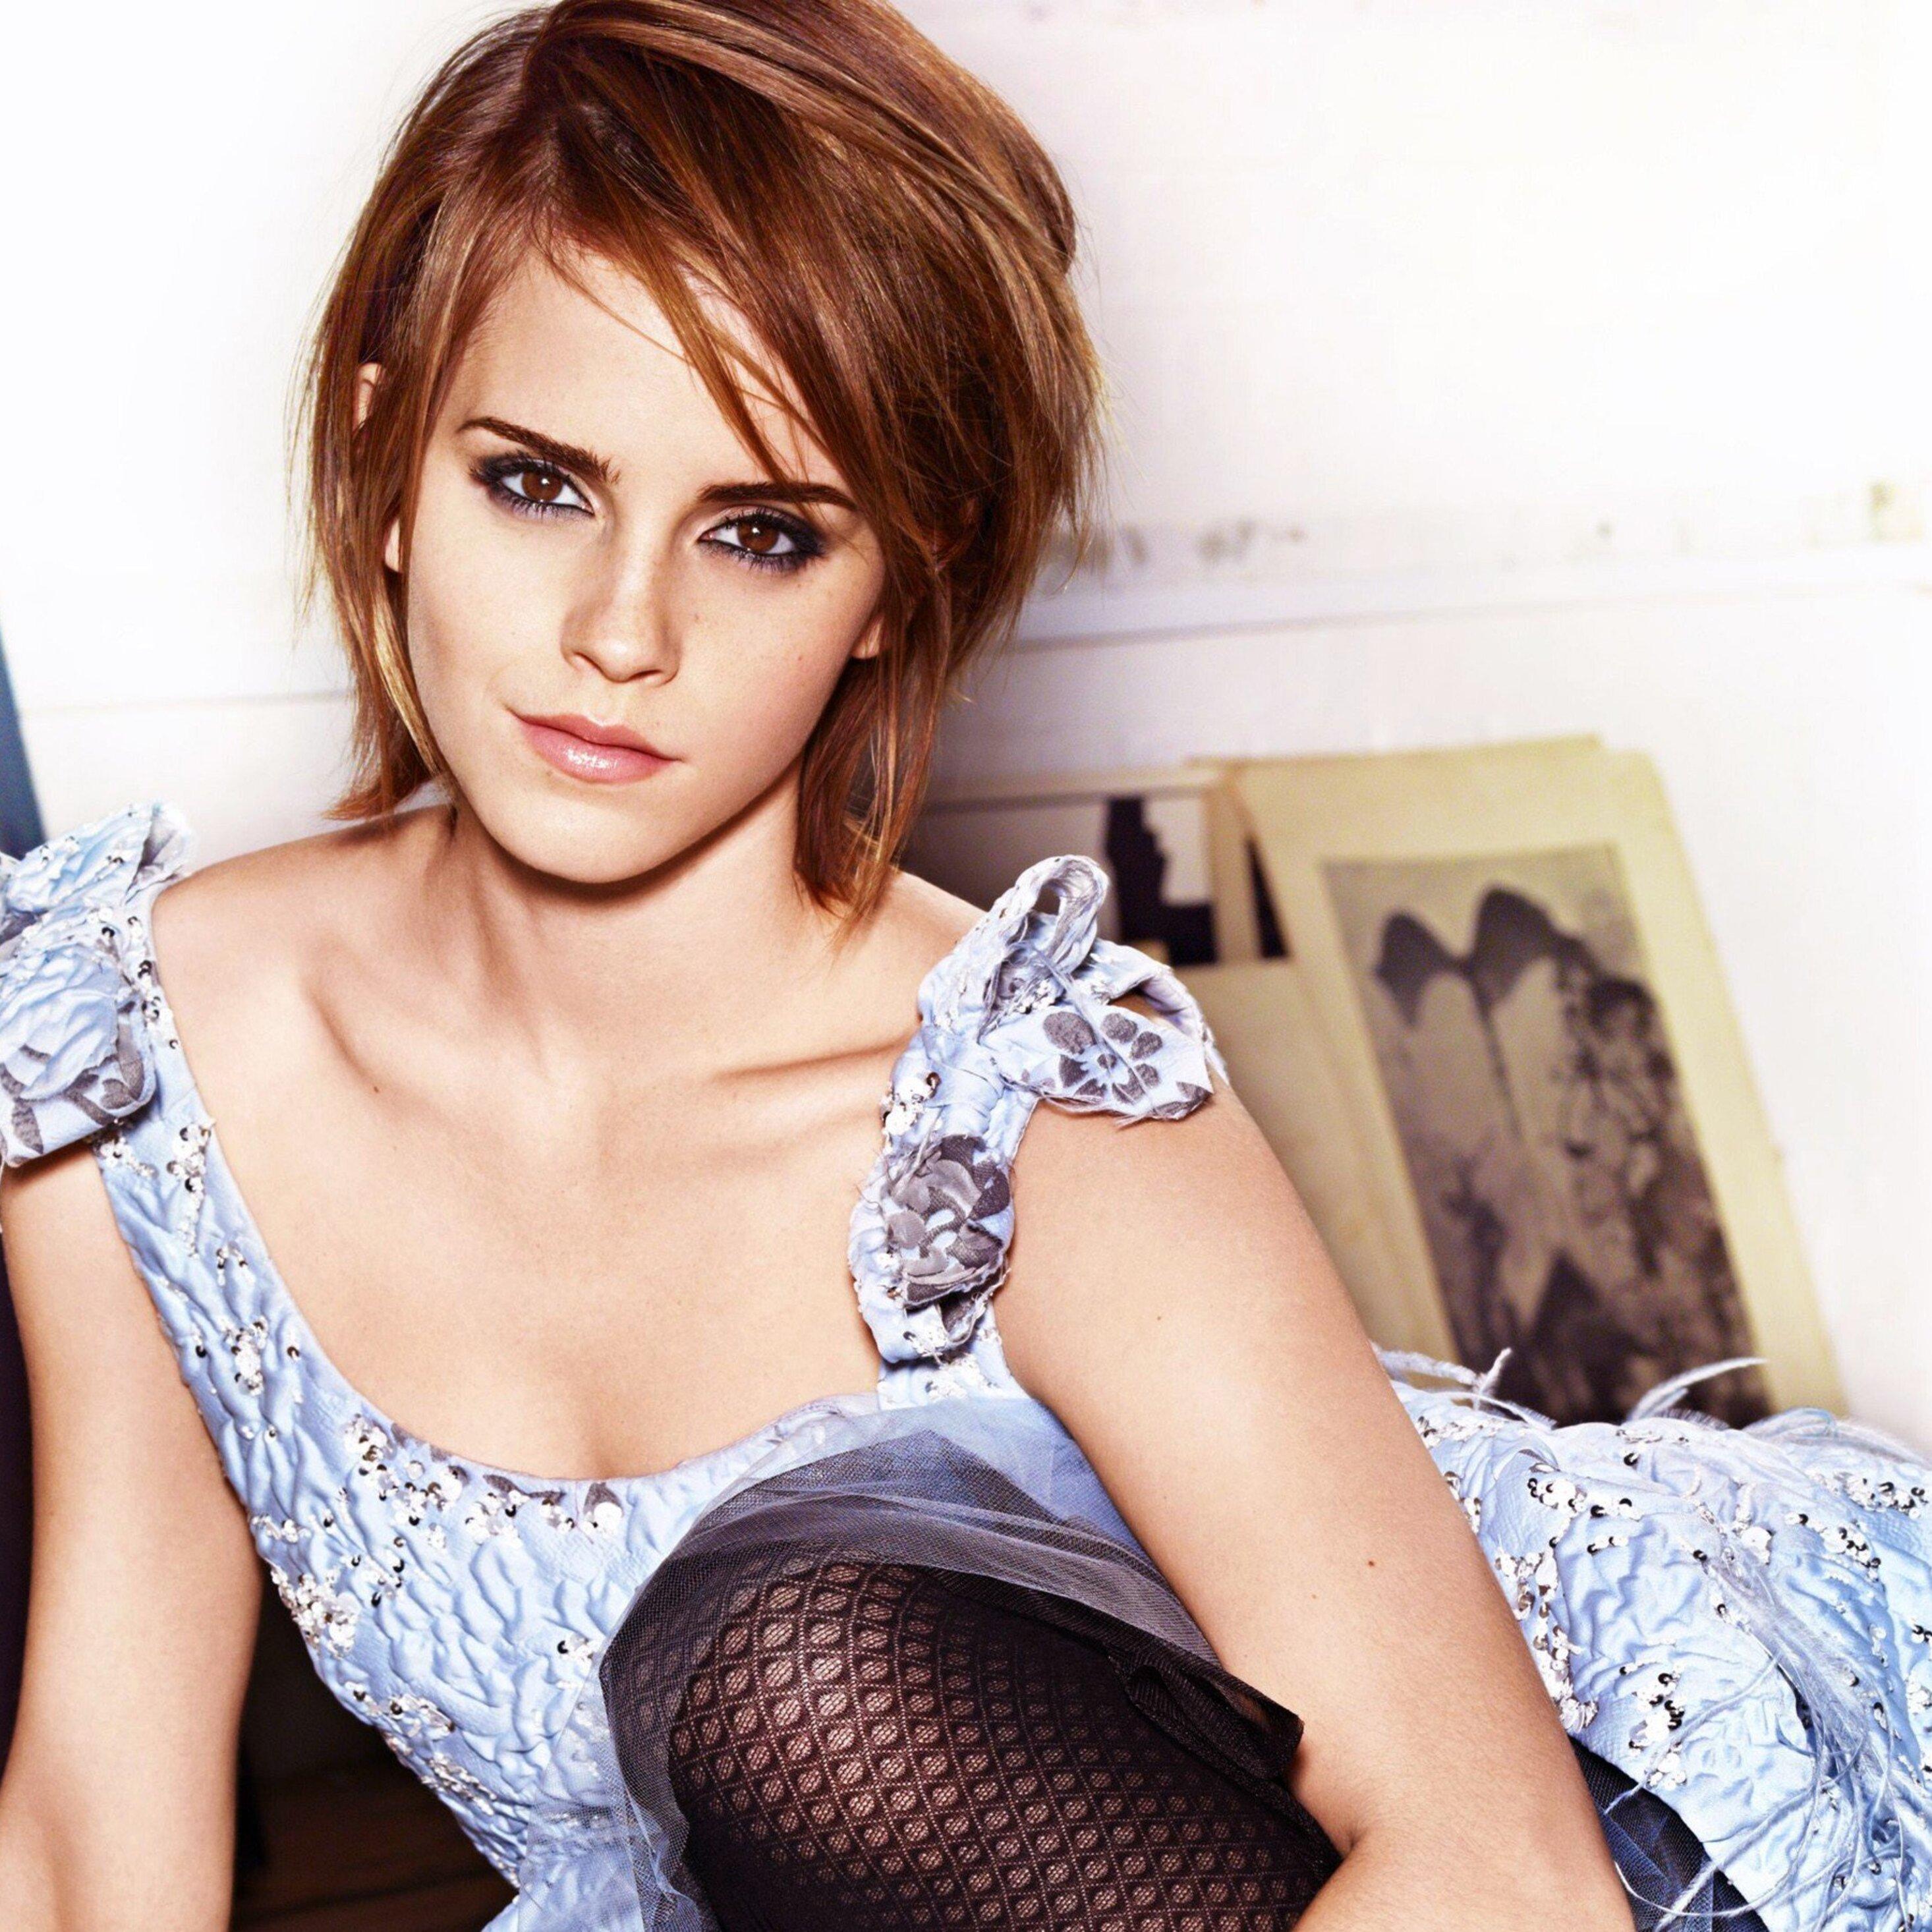 2932x2932 Emma Watson Hot Ipad Pro Retina Display HD 4k